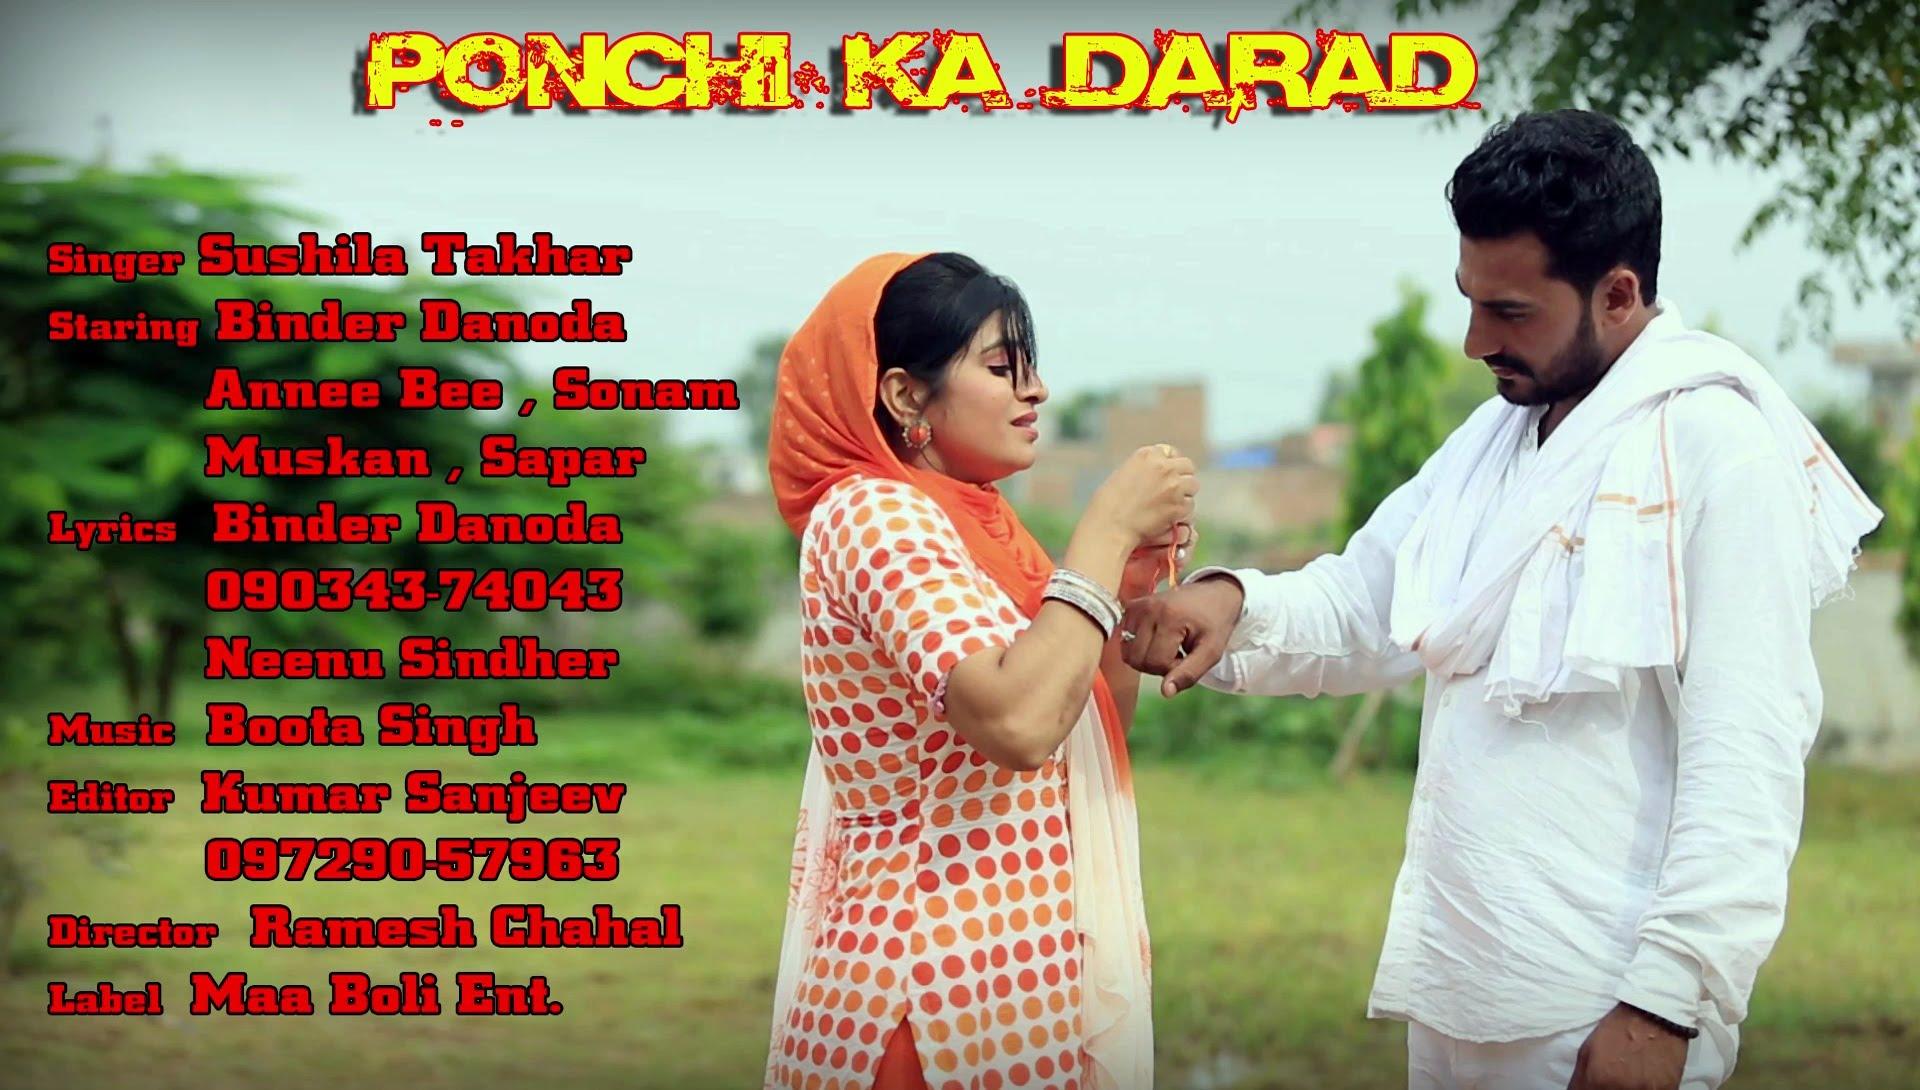 Ponchi Ka Darad Song By Binder Danoda & Annee Bee